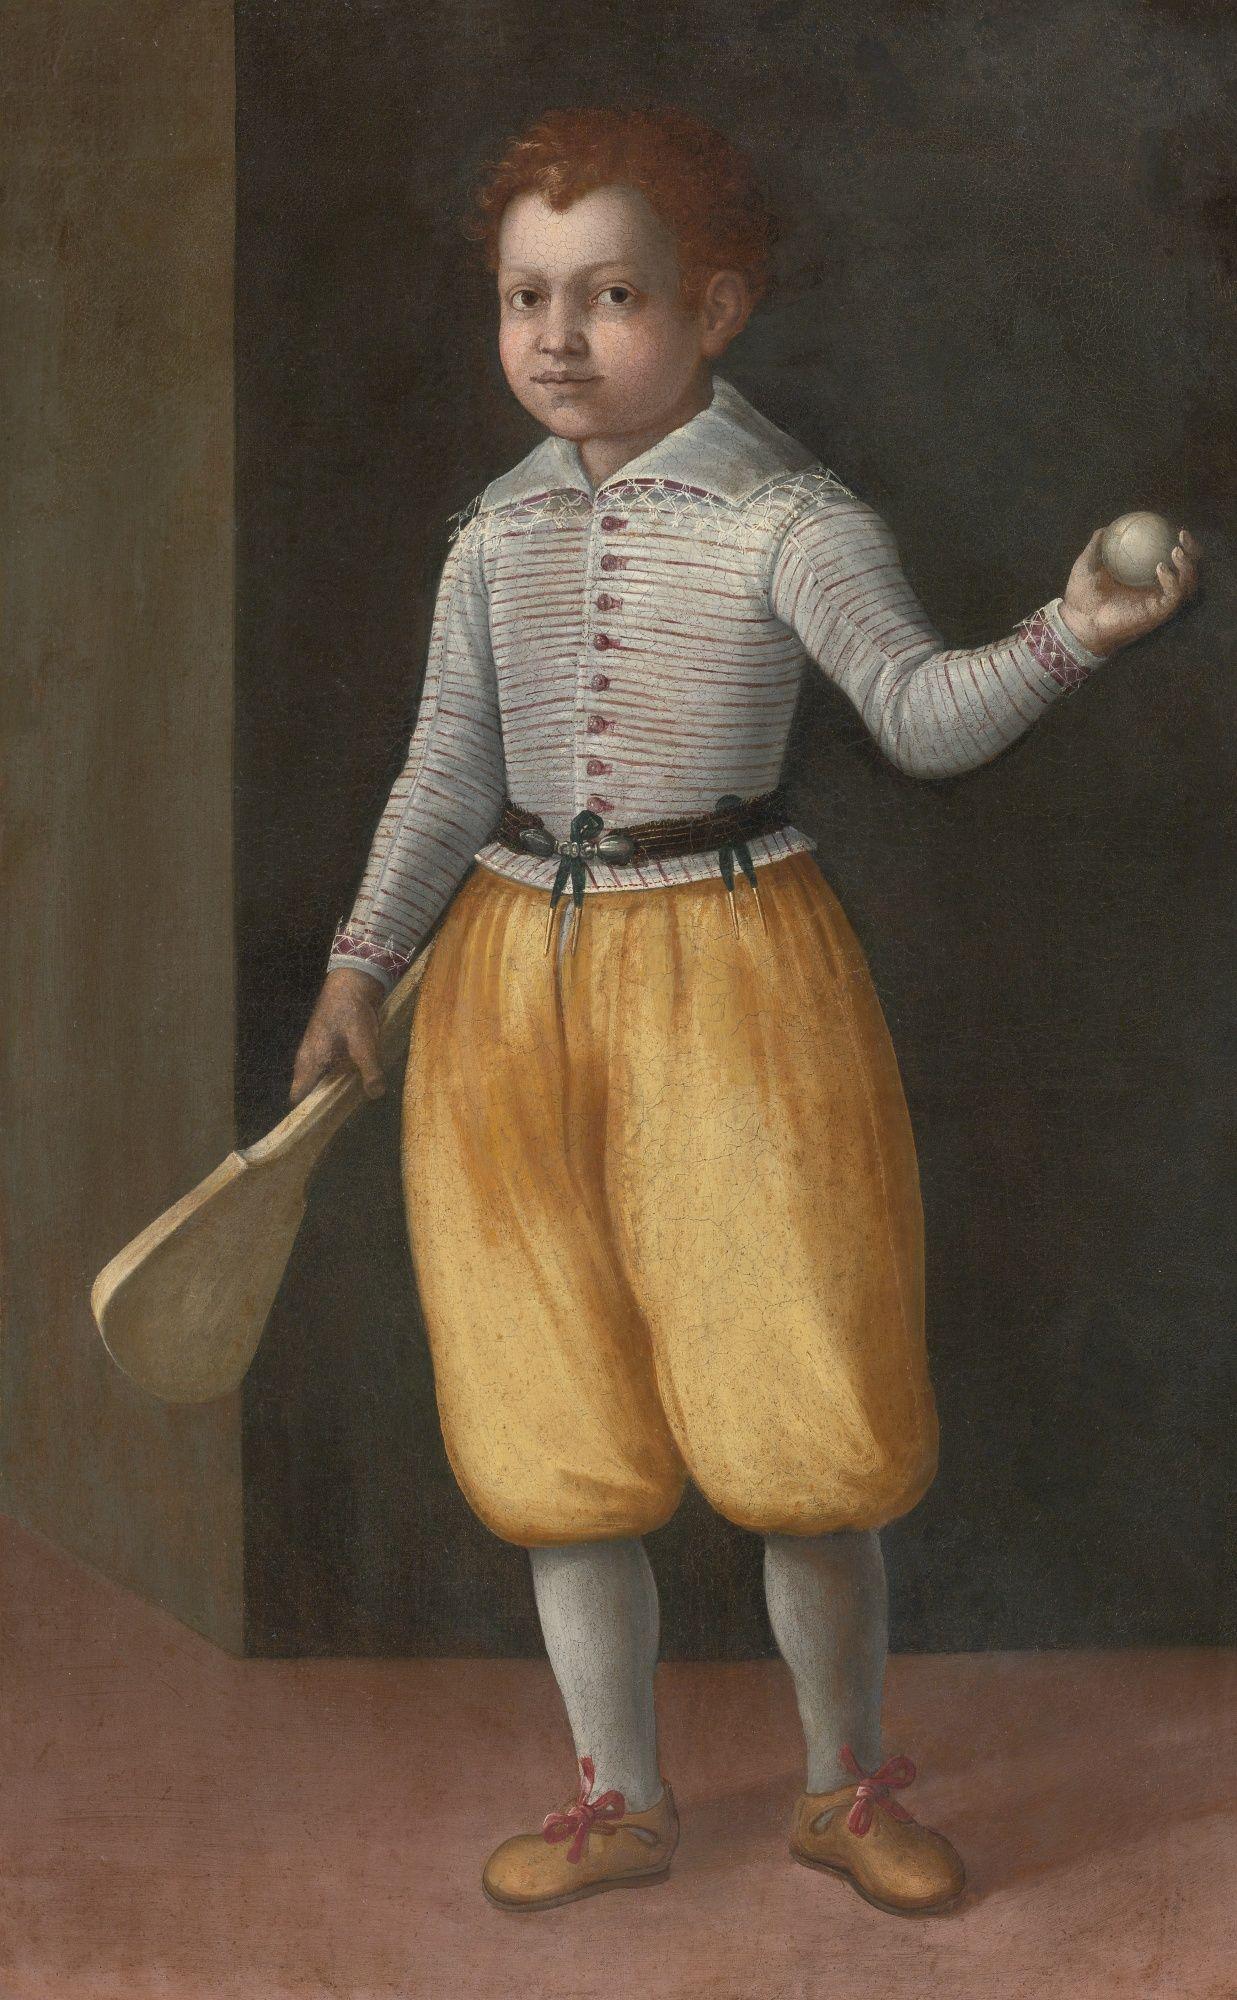 Boy with tennis racket ~ Cremonese School ~ late 16th century